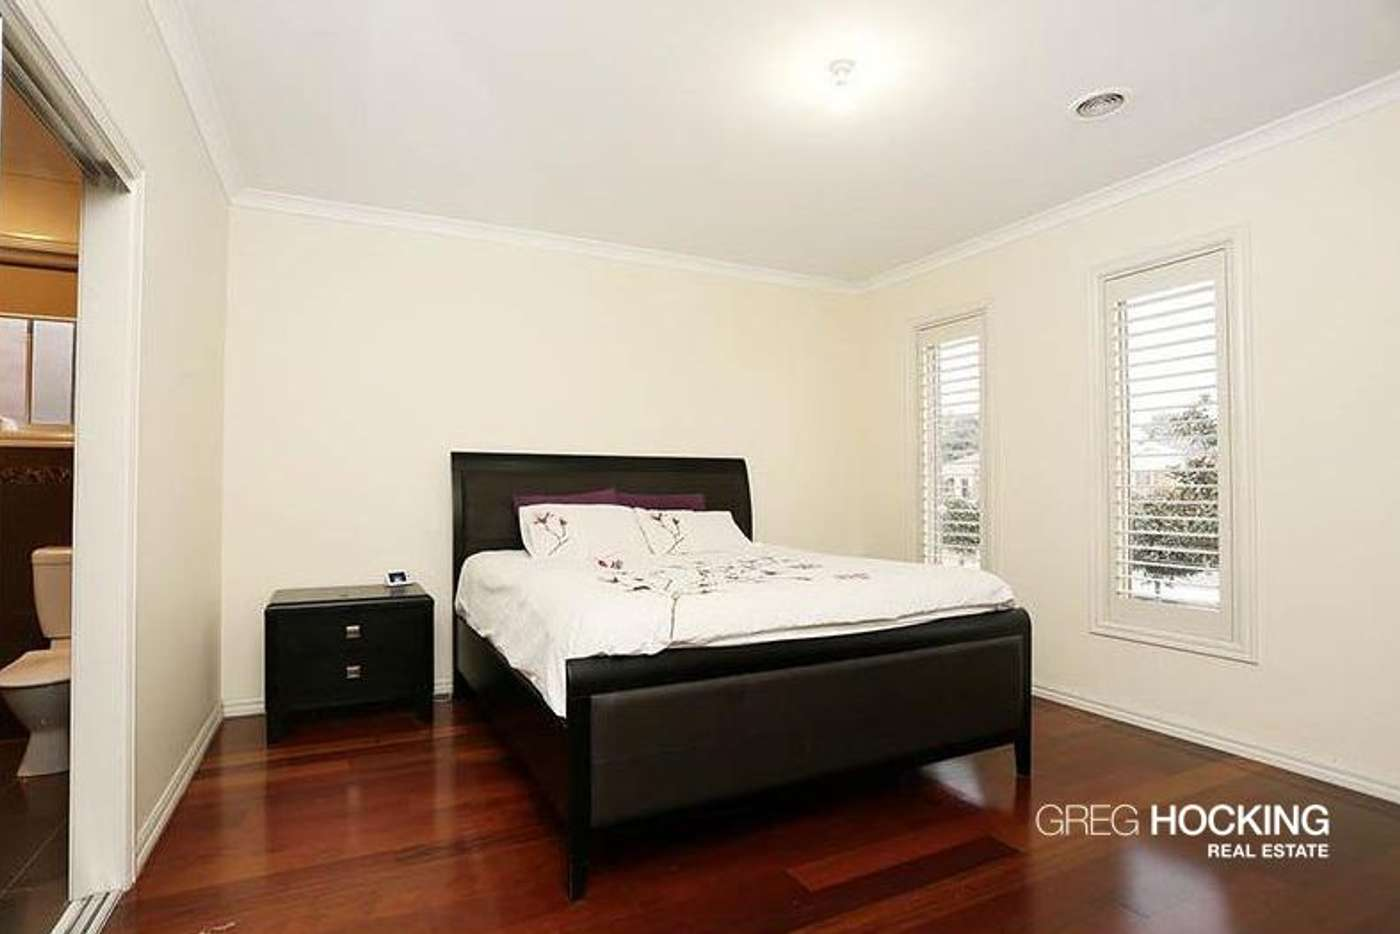 Sixth view of Homely house listing, 45 Jacaranda Drive, Taylors Hill VIC 3037